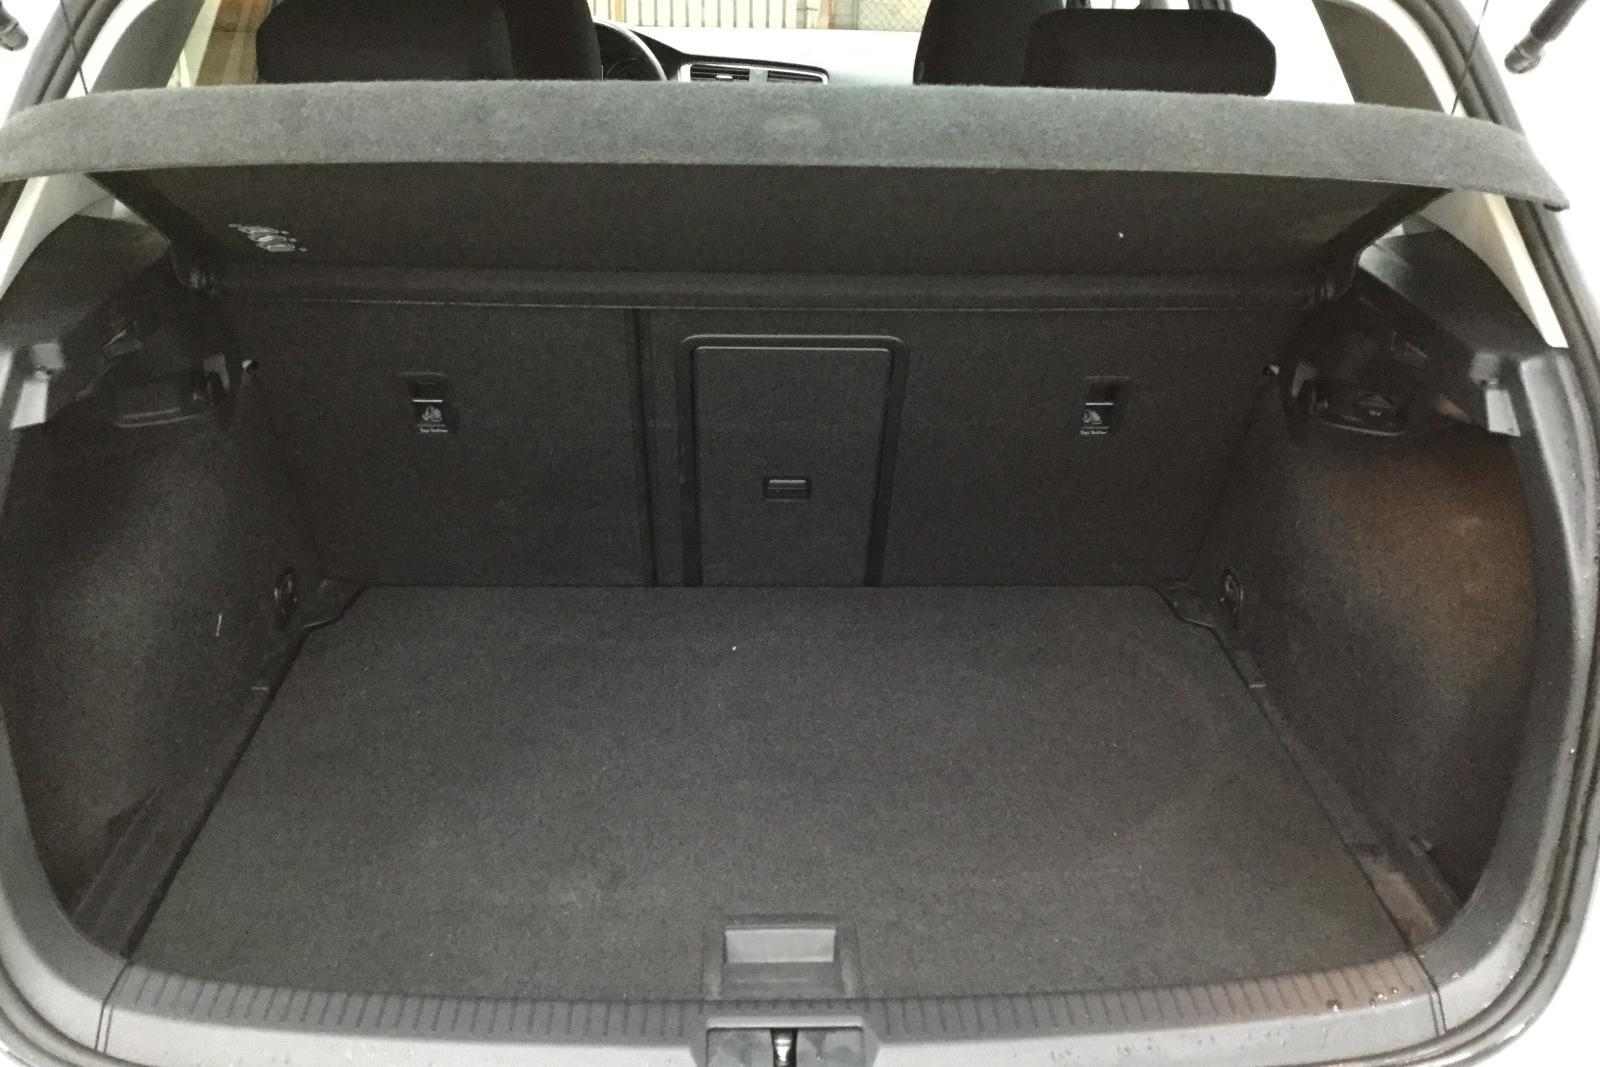 VW Golf VII 1.6 TDI BlueMotion Technology 5dr 4Motion (105hk) - 0 km - Manual - silver - 2014